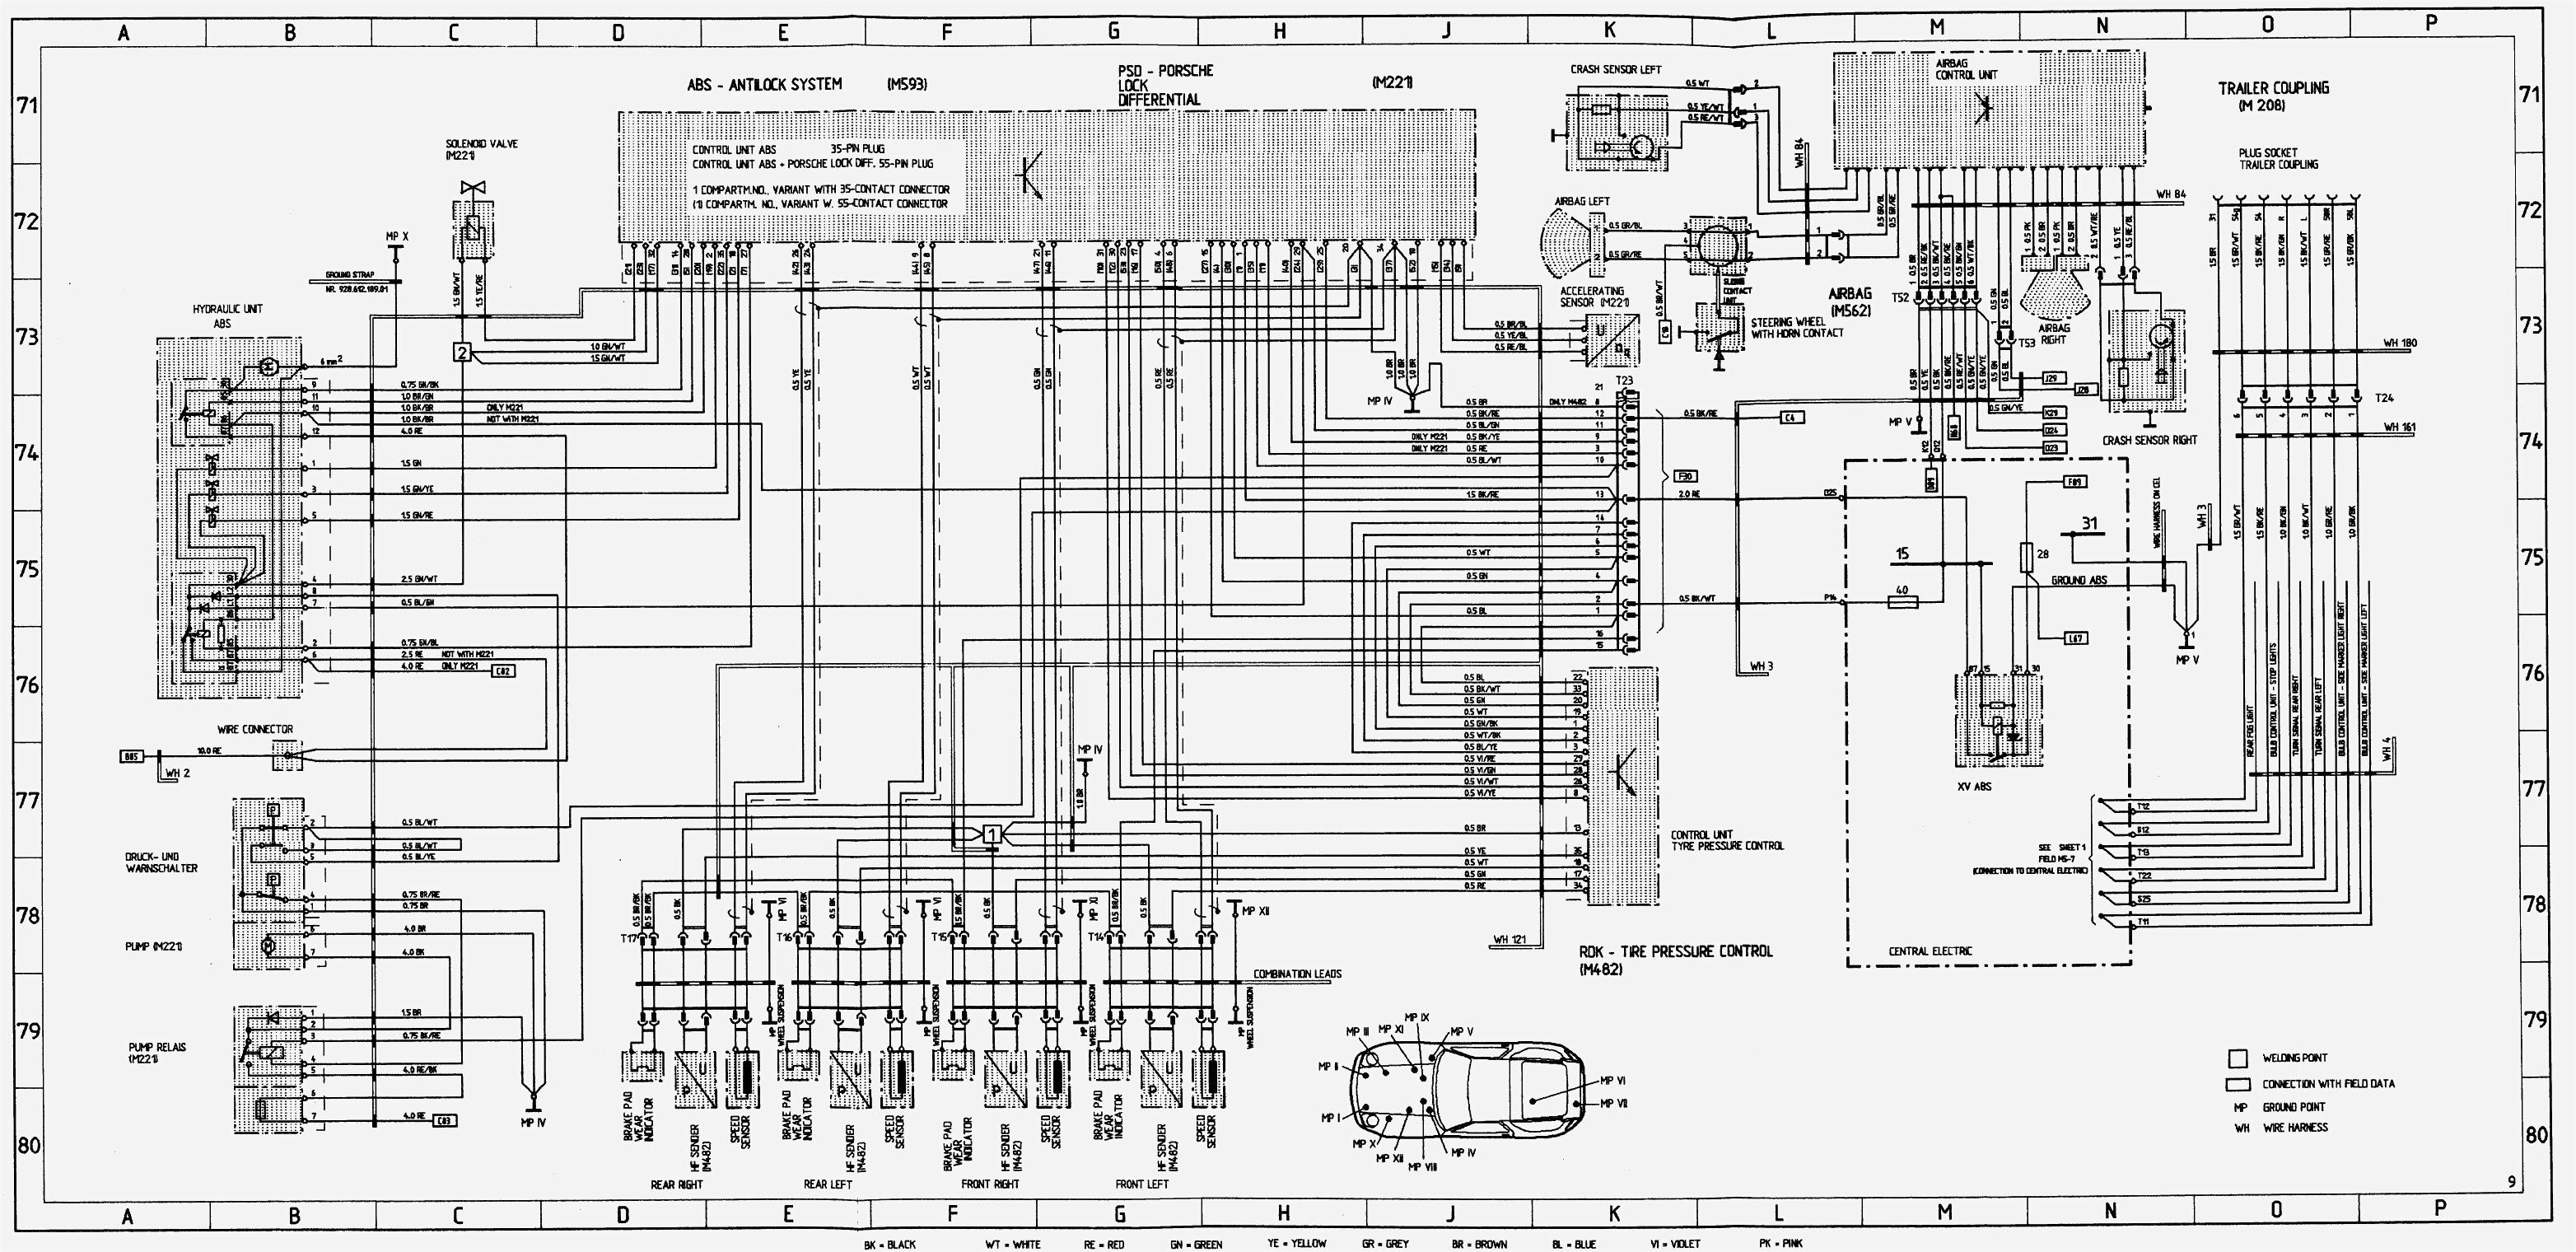 Bmw 318i Engine Diagram 1995 Bmw 318i Wiring Diagram Wiring Diagram Load Of Bmw 318i Engine Diagram Sundowner Wiring Diagram Wiring Diagram Datasource